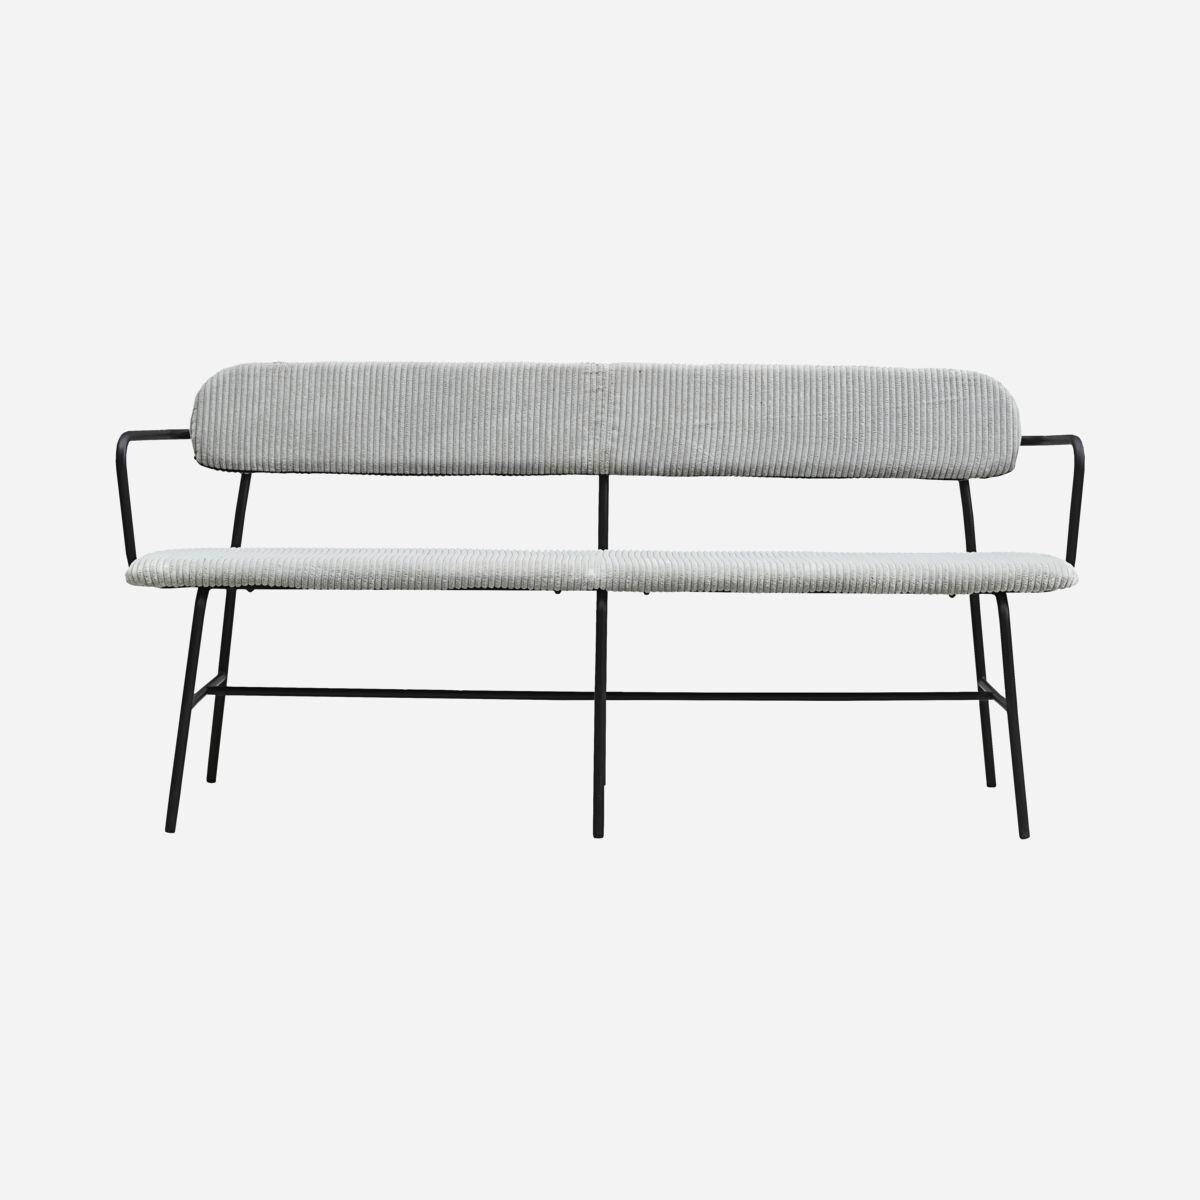 Bench%2C+Classico%2C+Light+grey